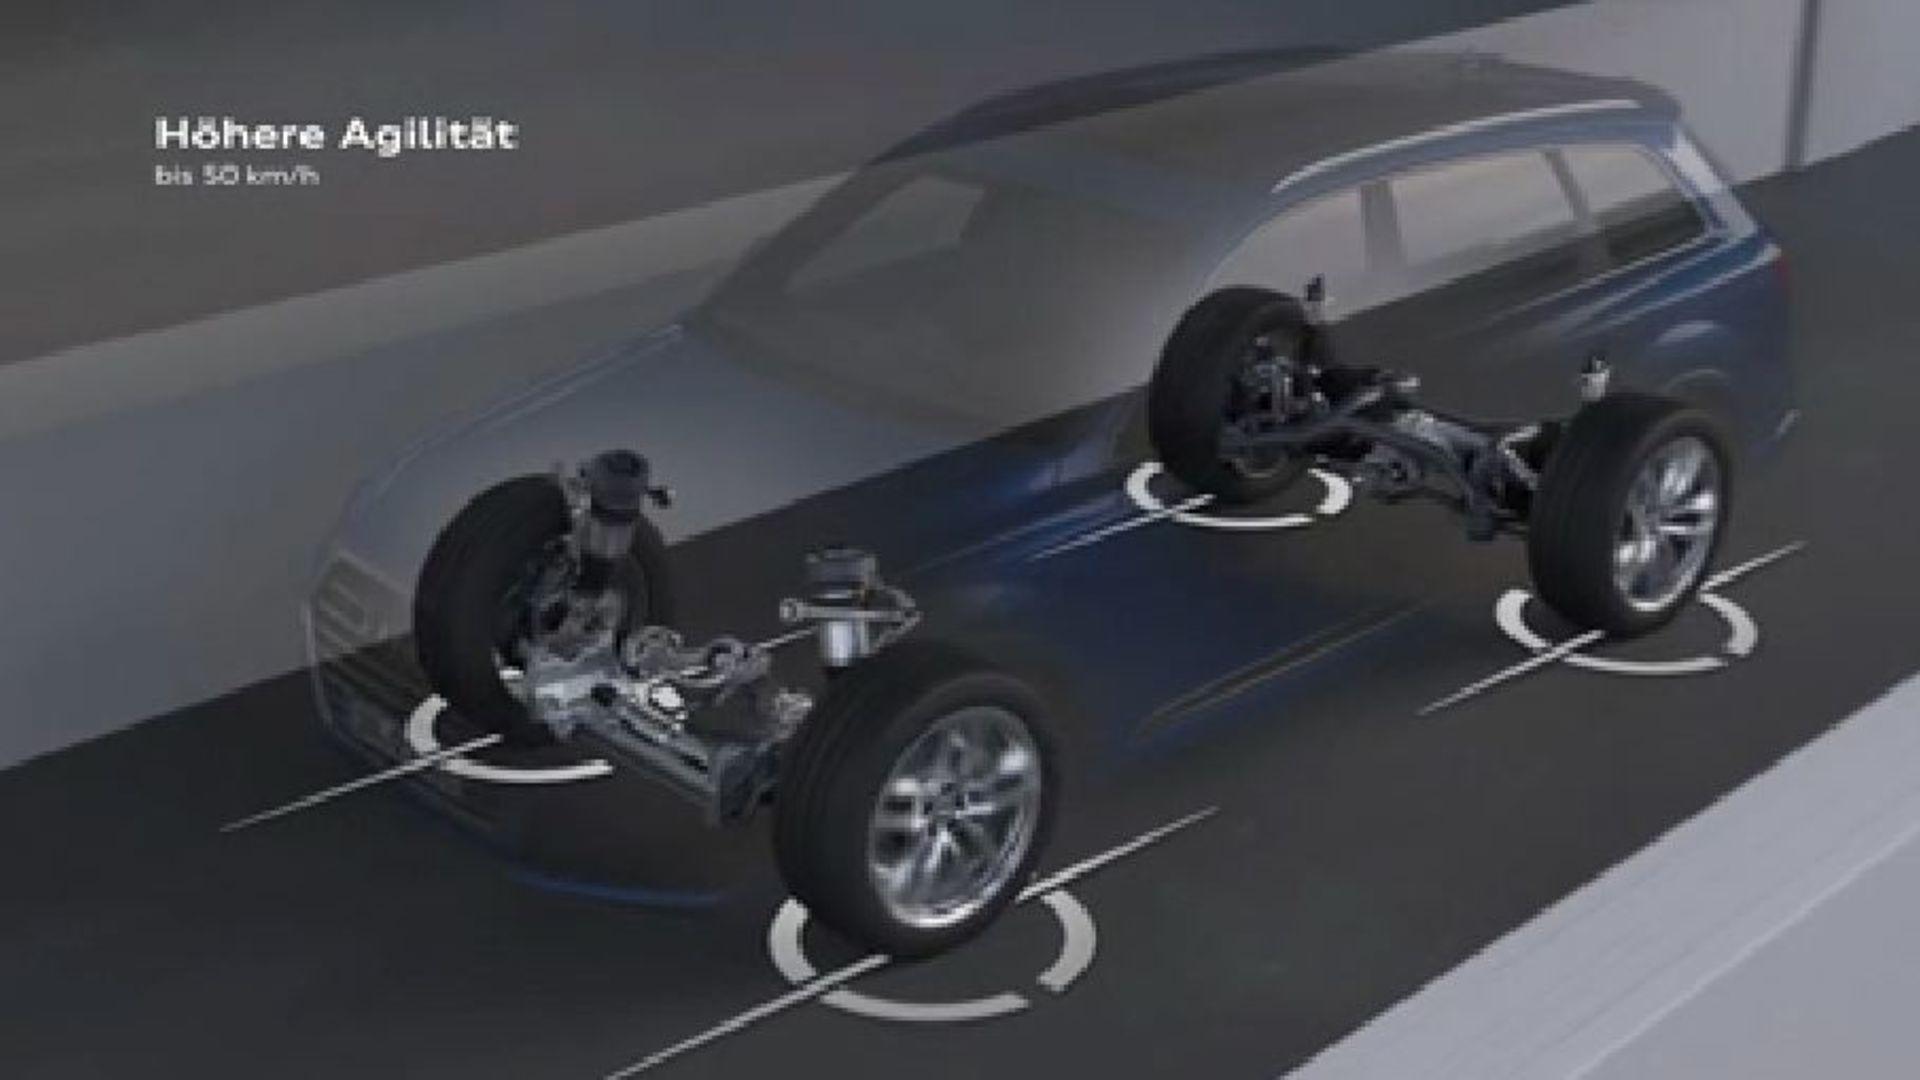 Audi Q7 3.0 TDI quattro Allradlenkung - Animation